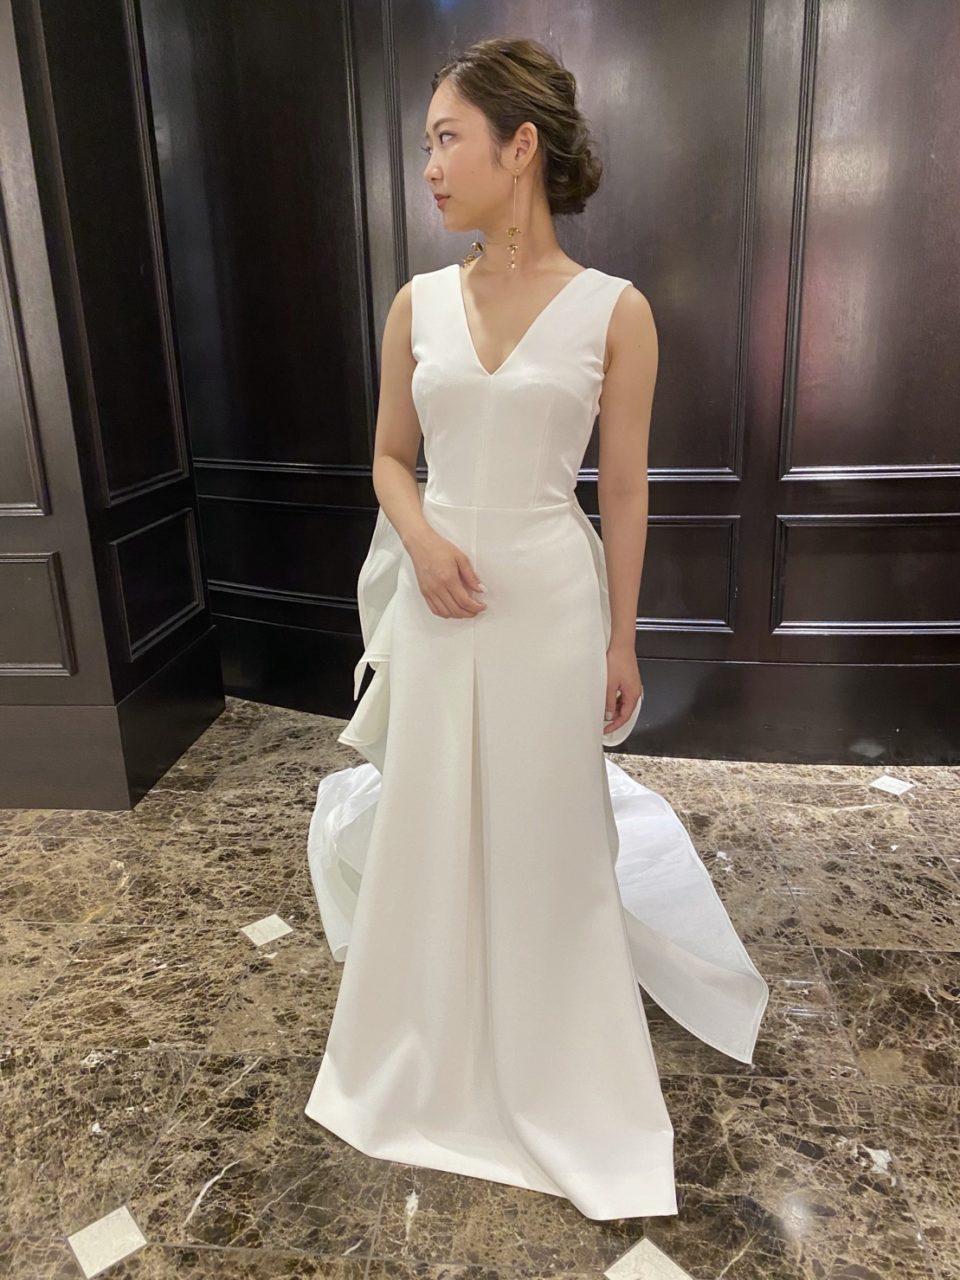 ANTONIO RIVA(アントニオリーヴァ) マーメイドドレス DEBORA